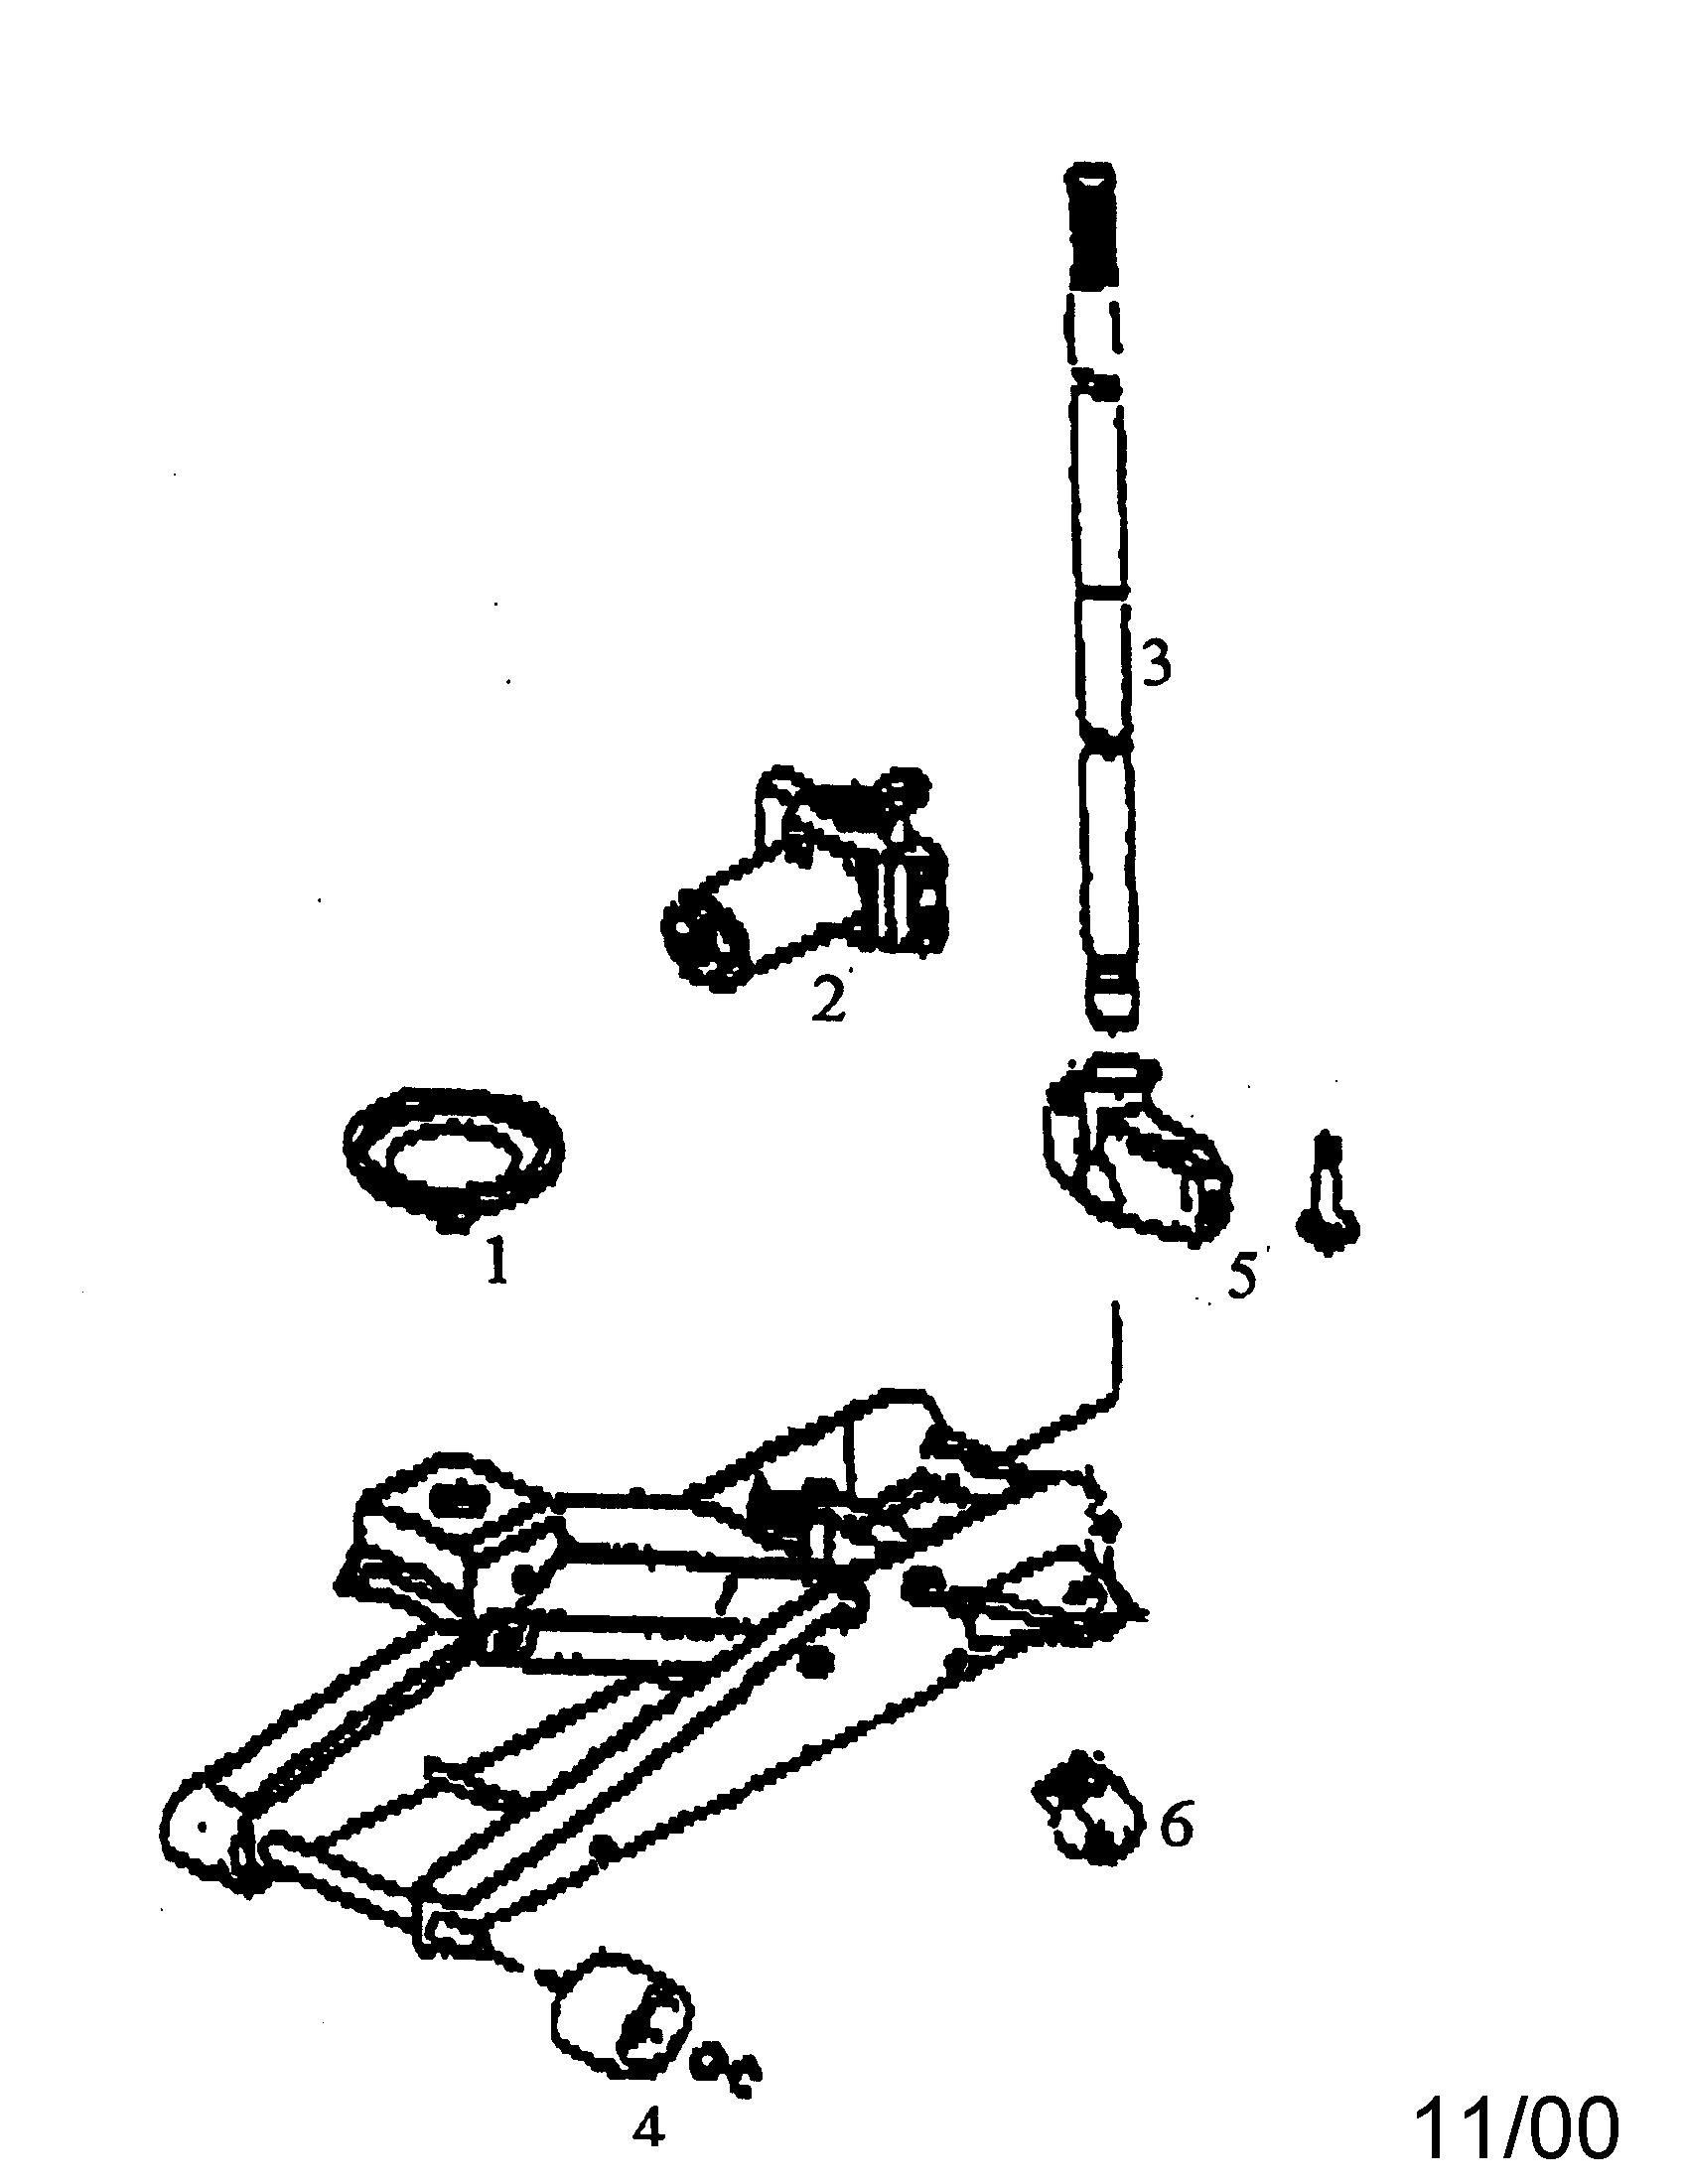 Craftsman model 21450145 jack hydraulic genuine parts